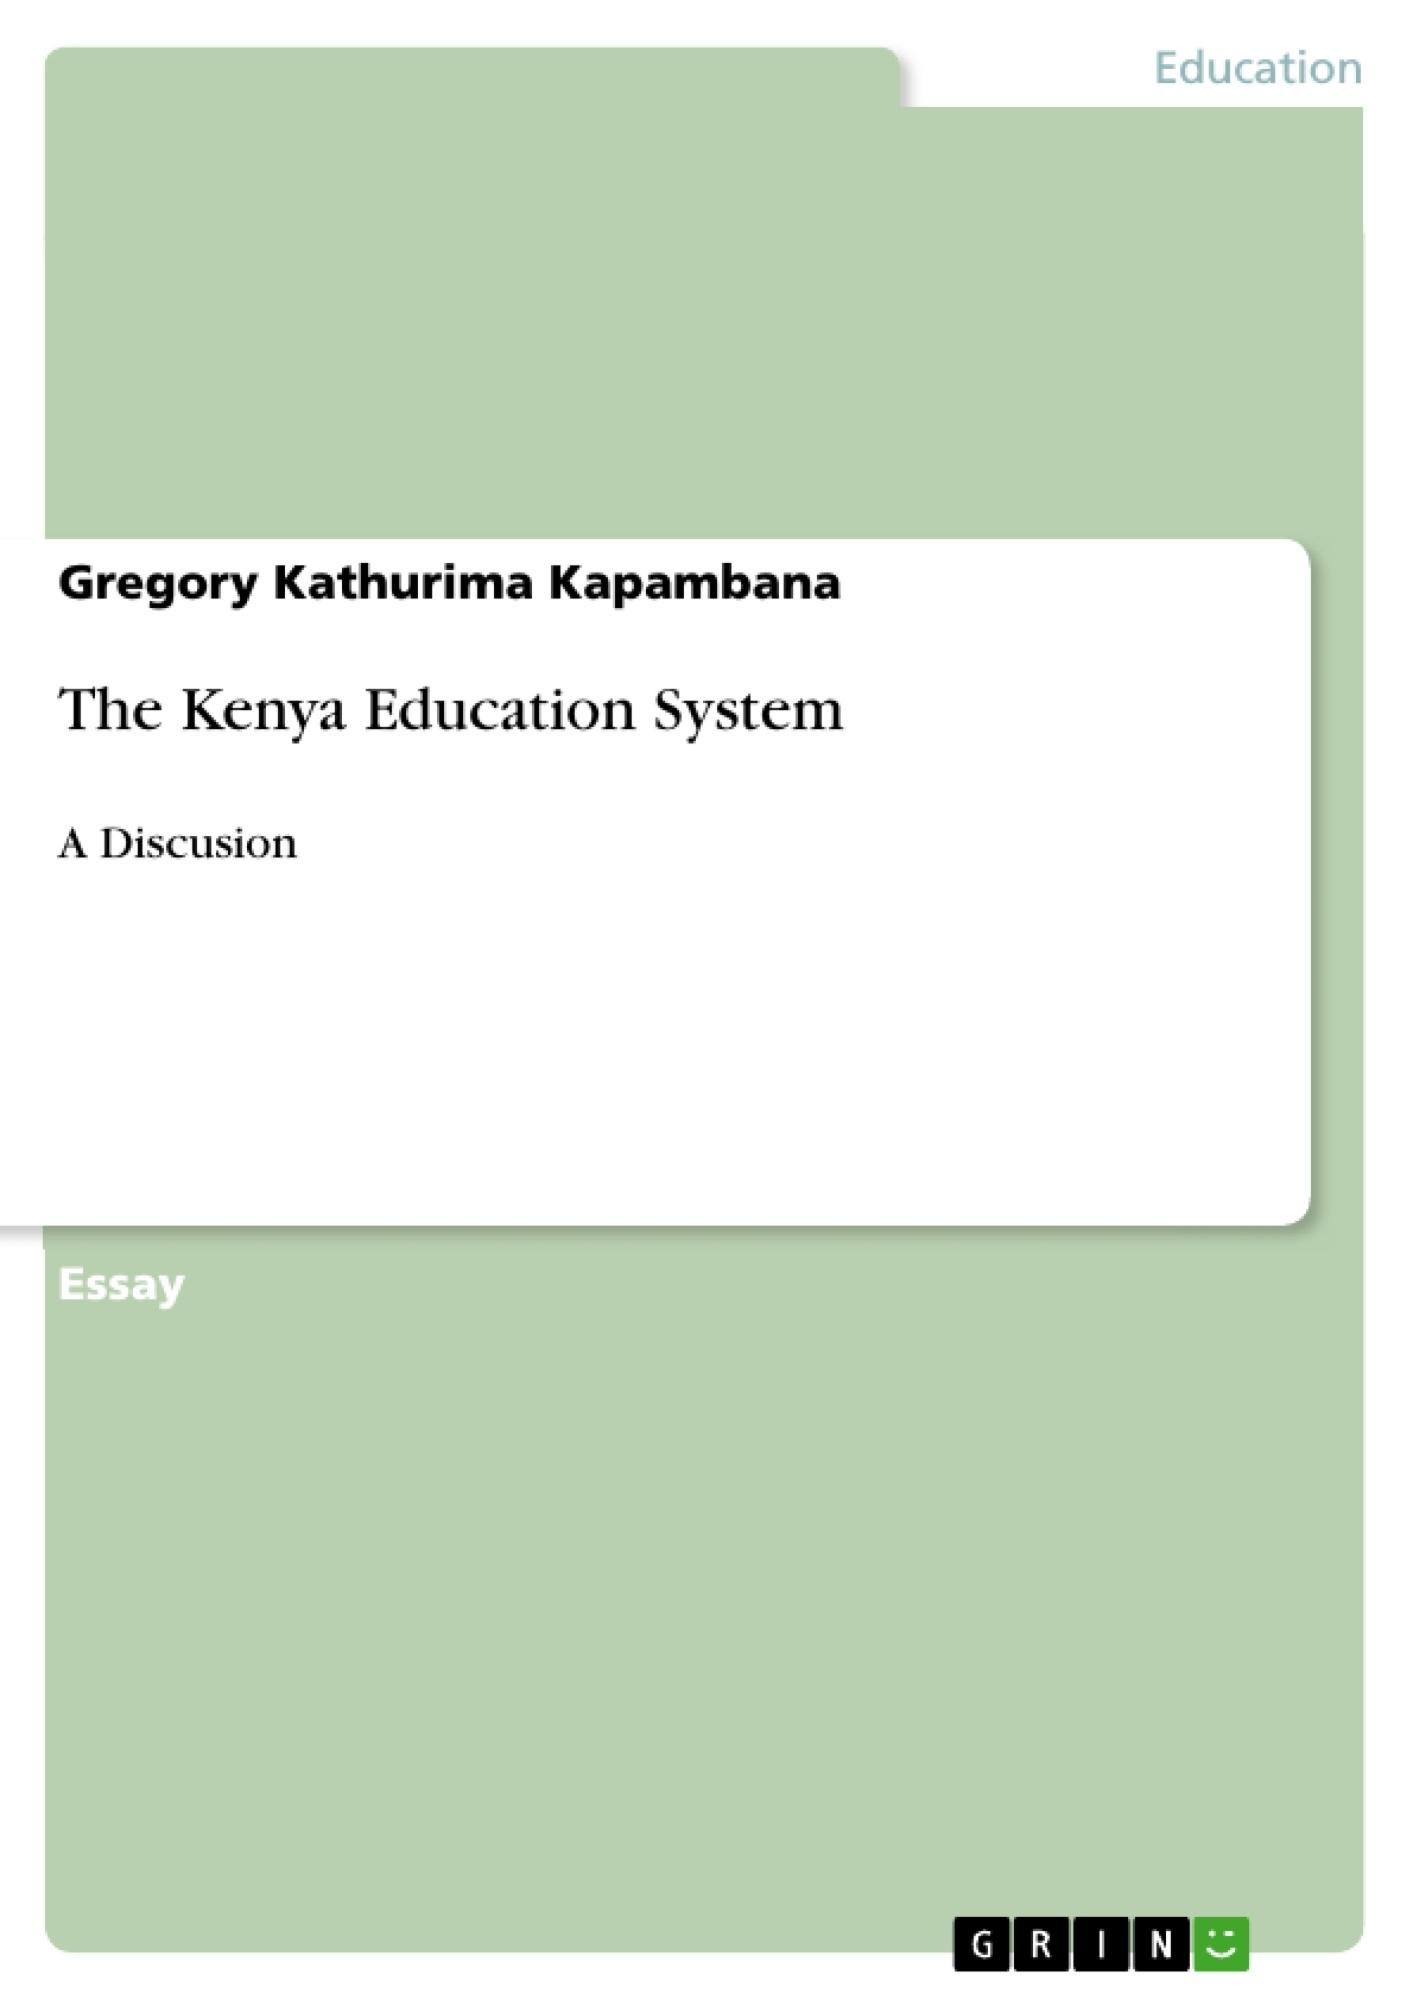 Title: The Kenya Education System